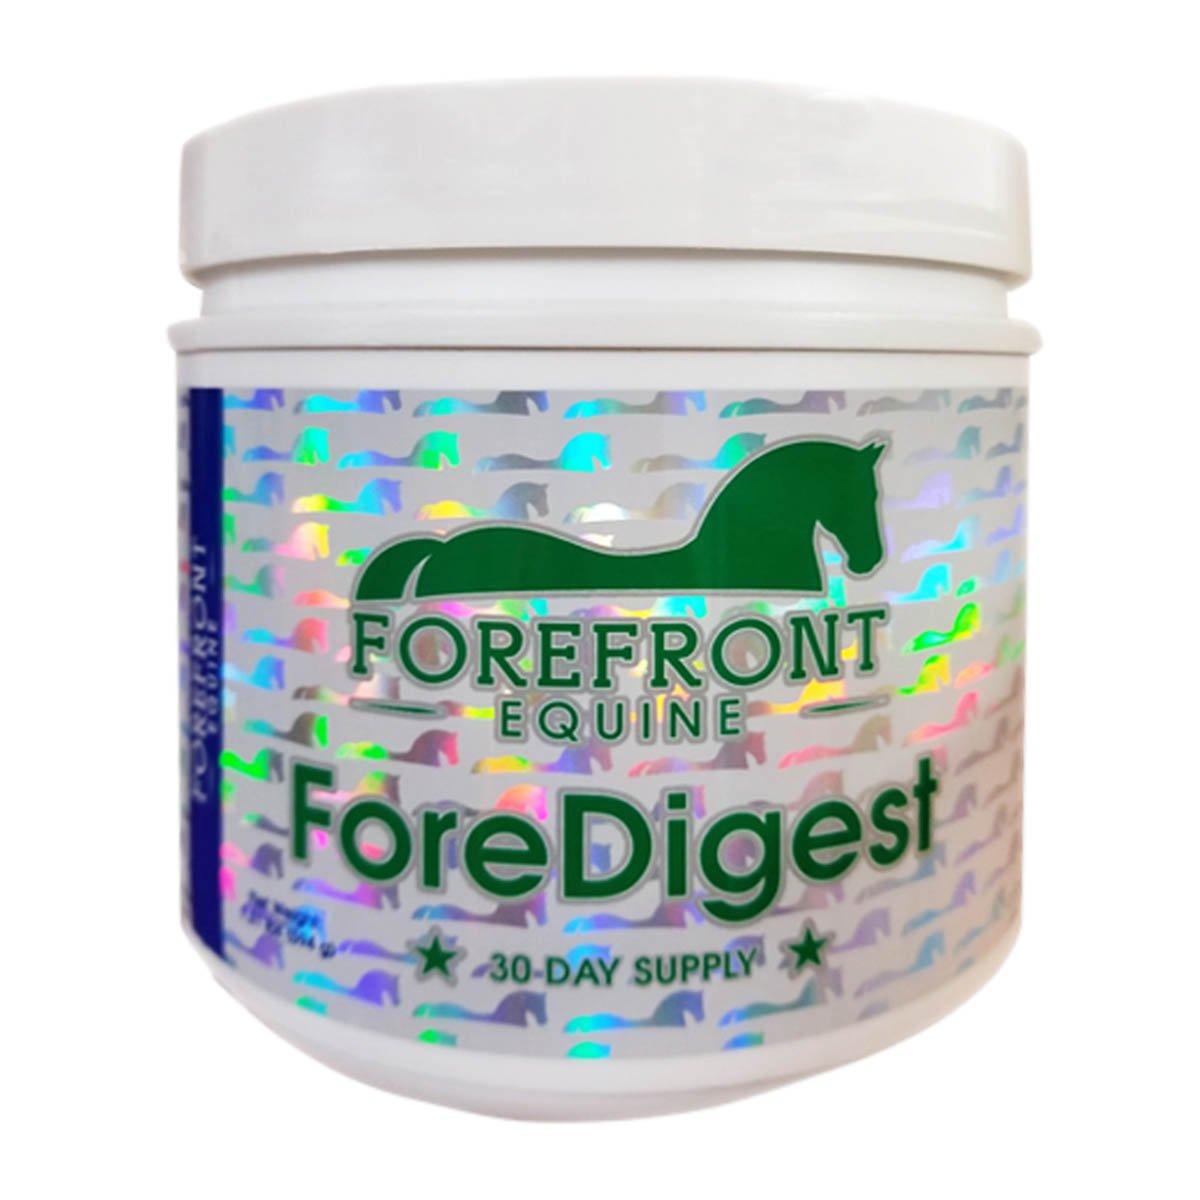 ForeFront Equine, LLC ForeDigest, 1.31 lb, 30 Day Supply